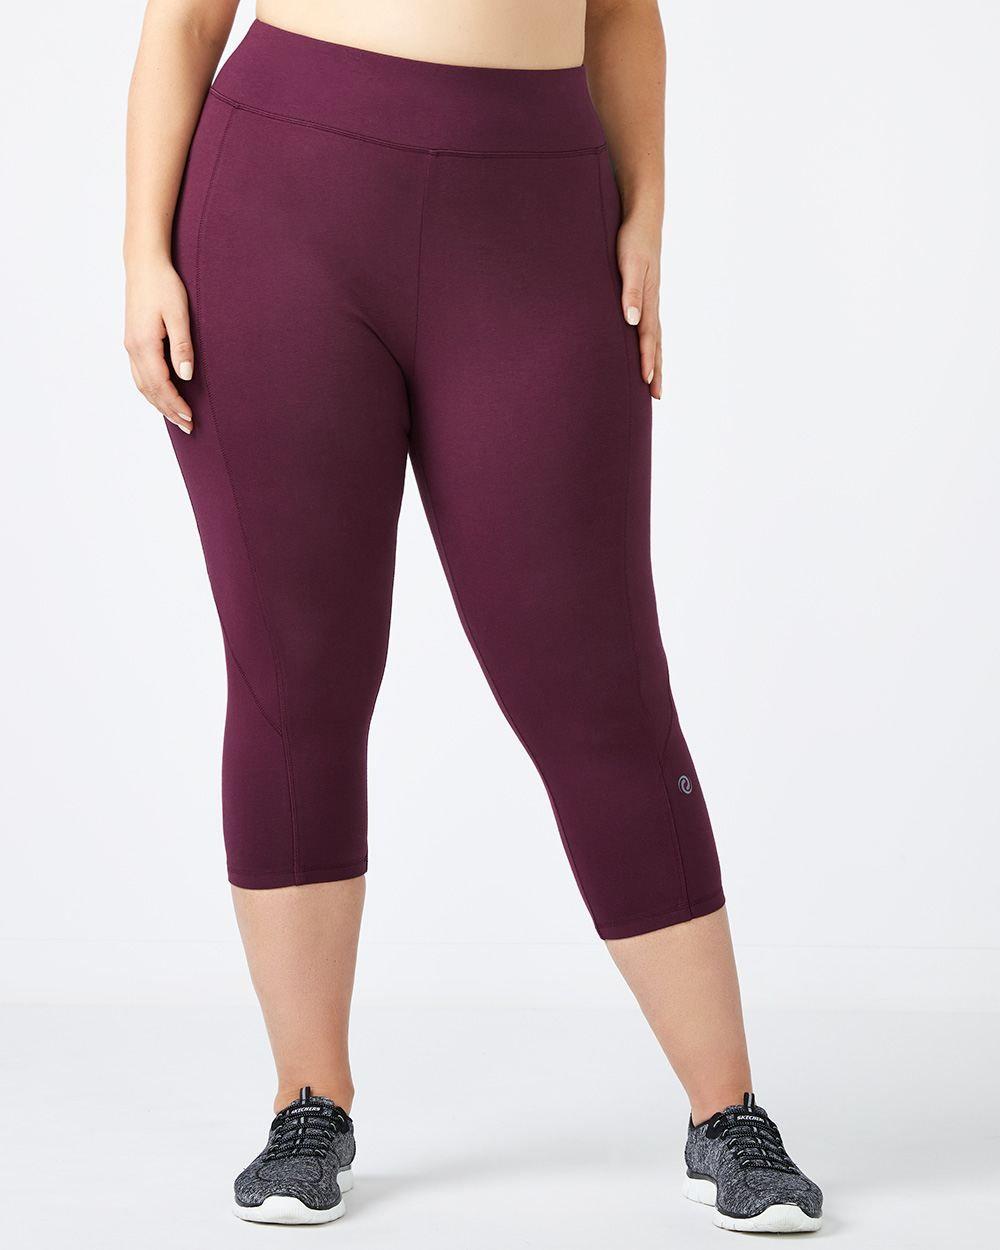 2ed3acf3ecffa Shop online for ONLINE ONLY - Plus-Size Basic Capri Legging - Essentials.  Find Activewear